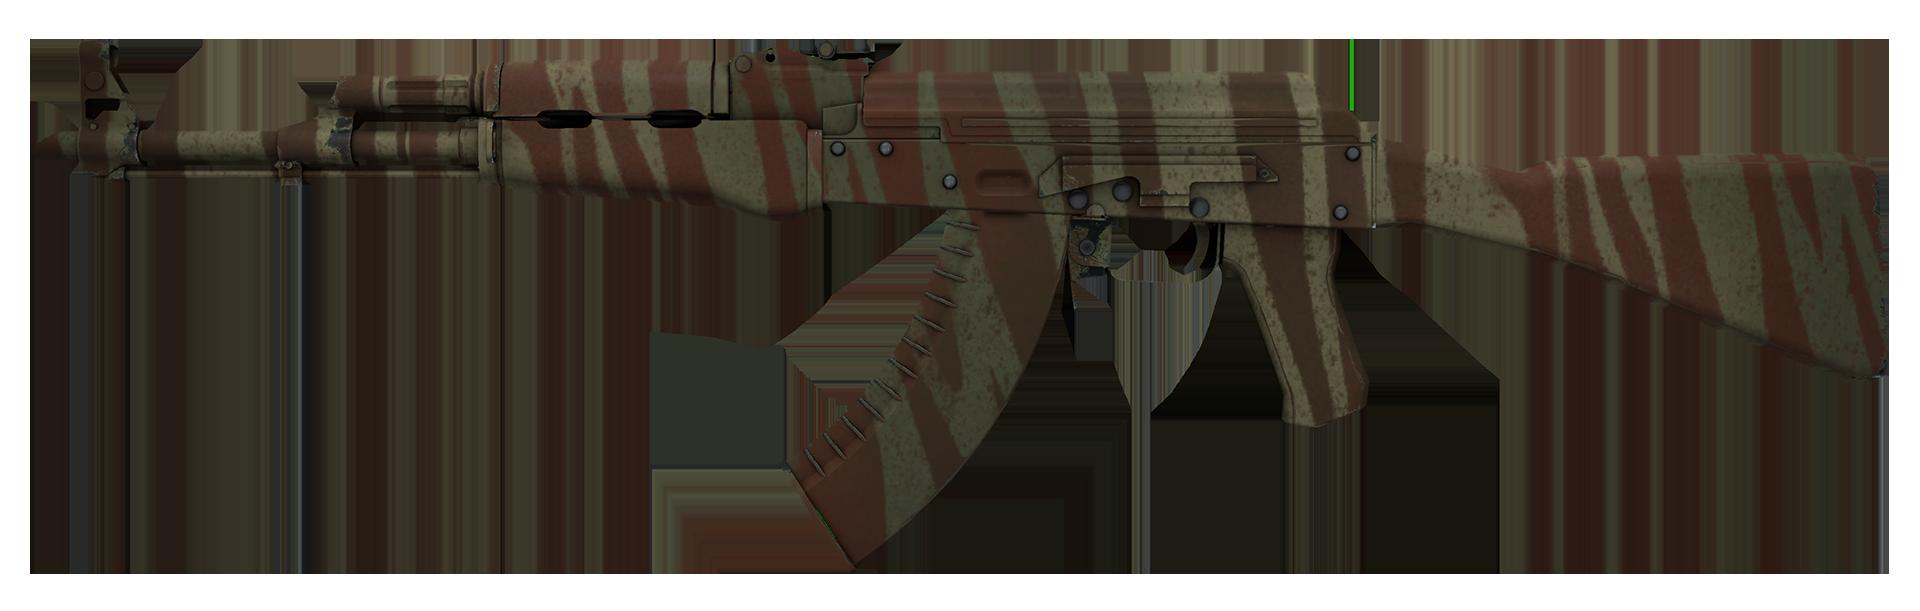 AK-47 Predator Large Rendering